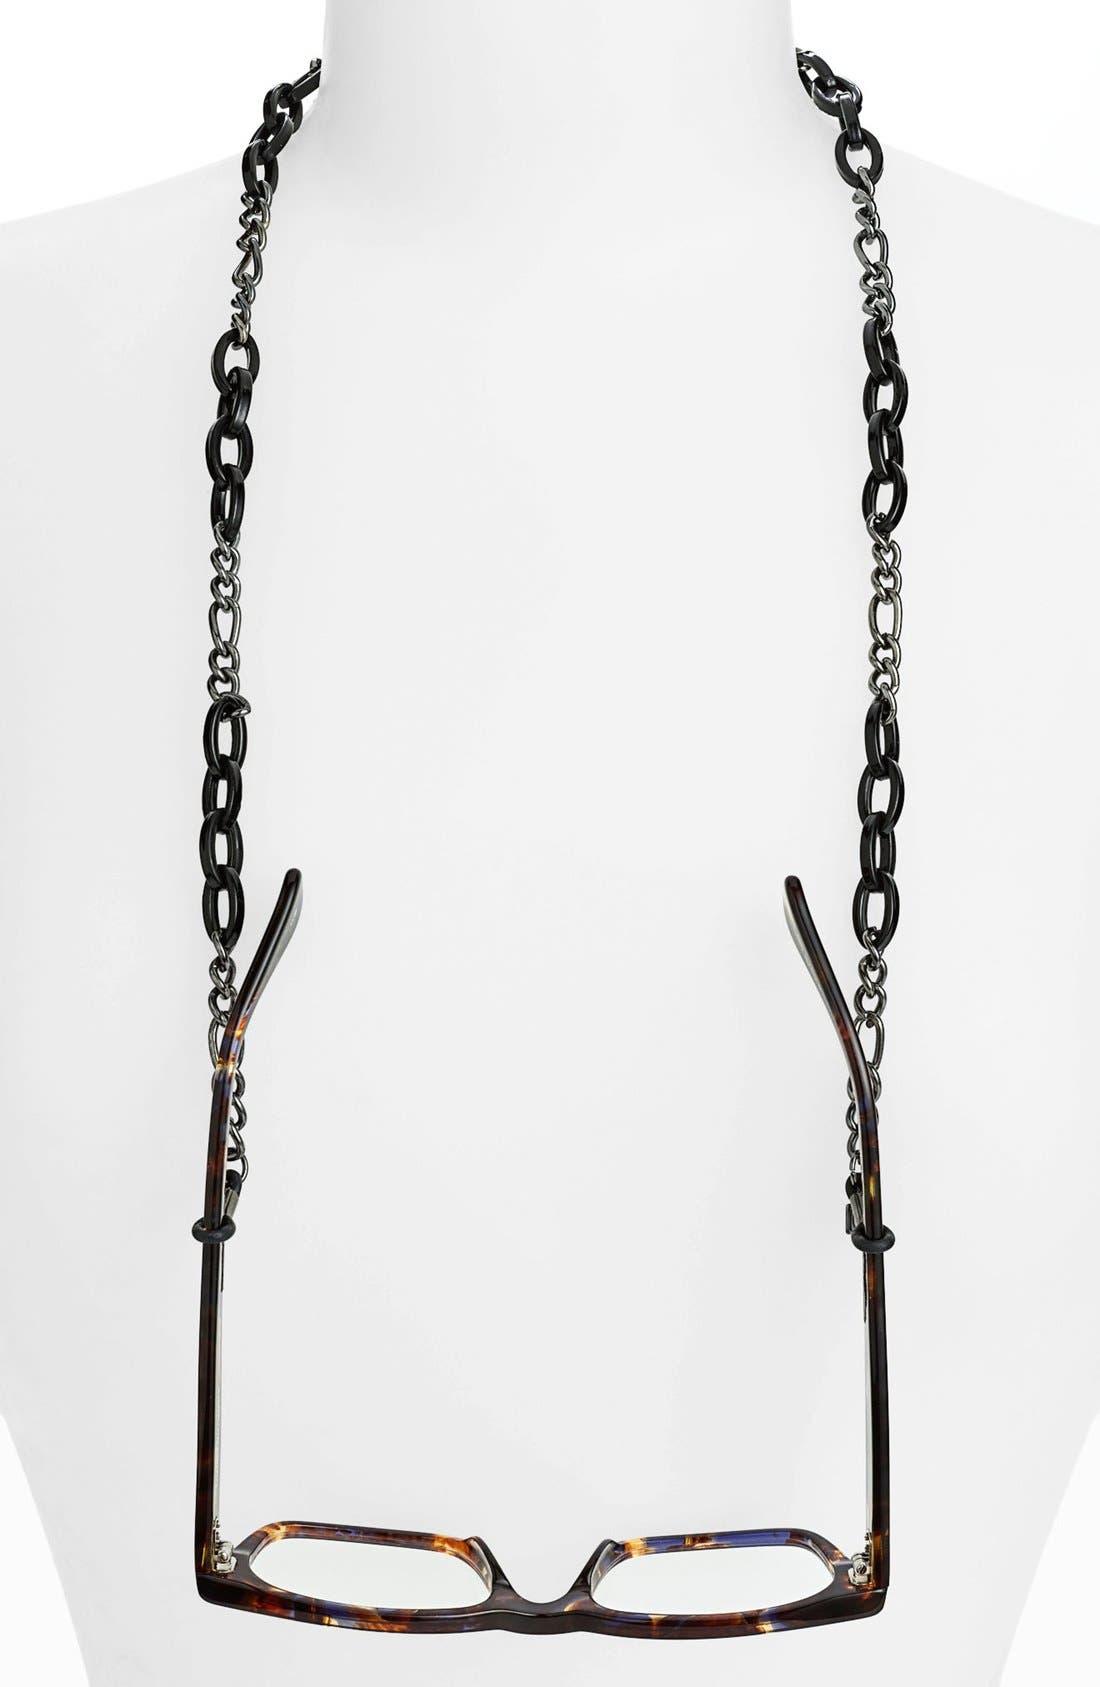 Main Image - Corinne McCormack 'Links' Eyewear Chain